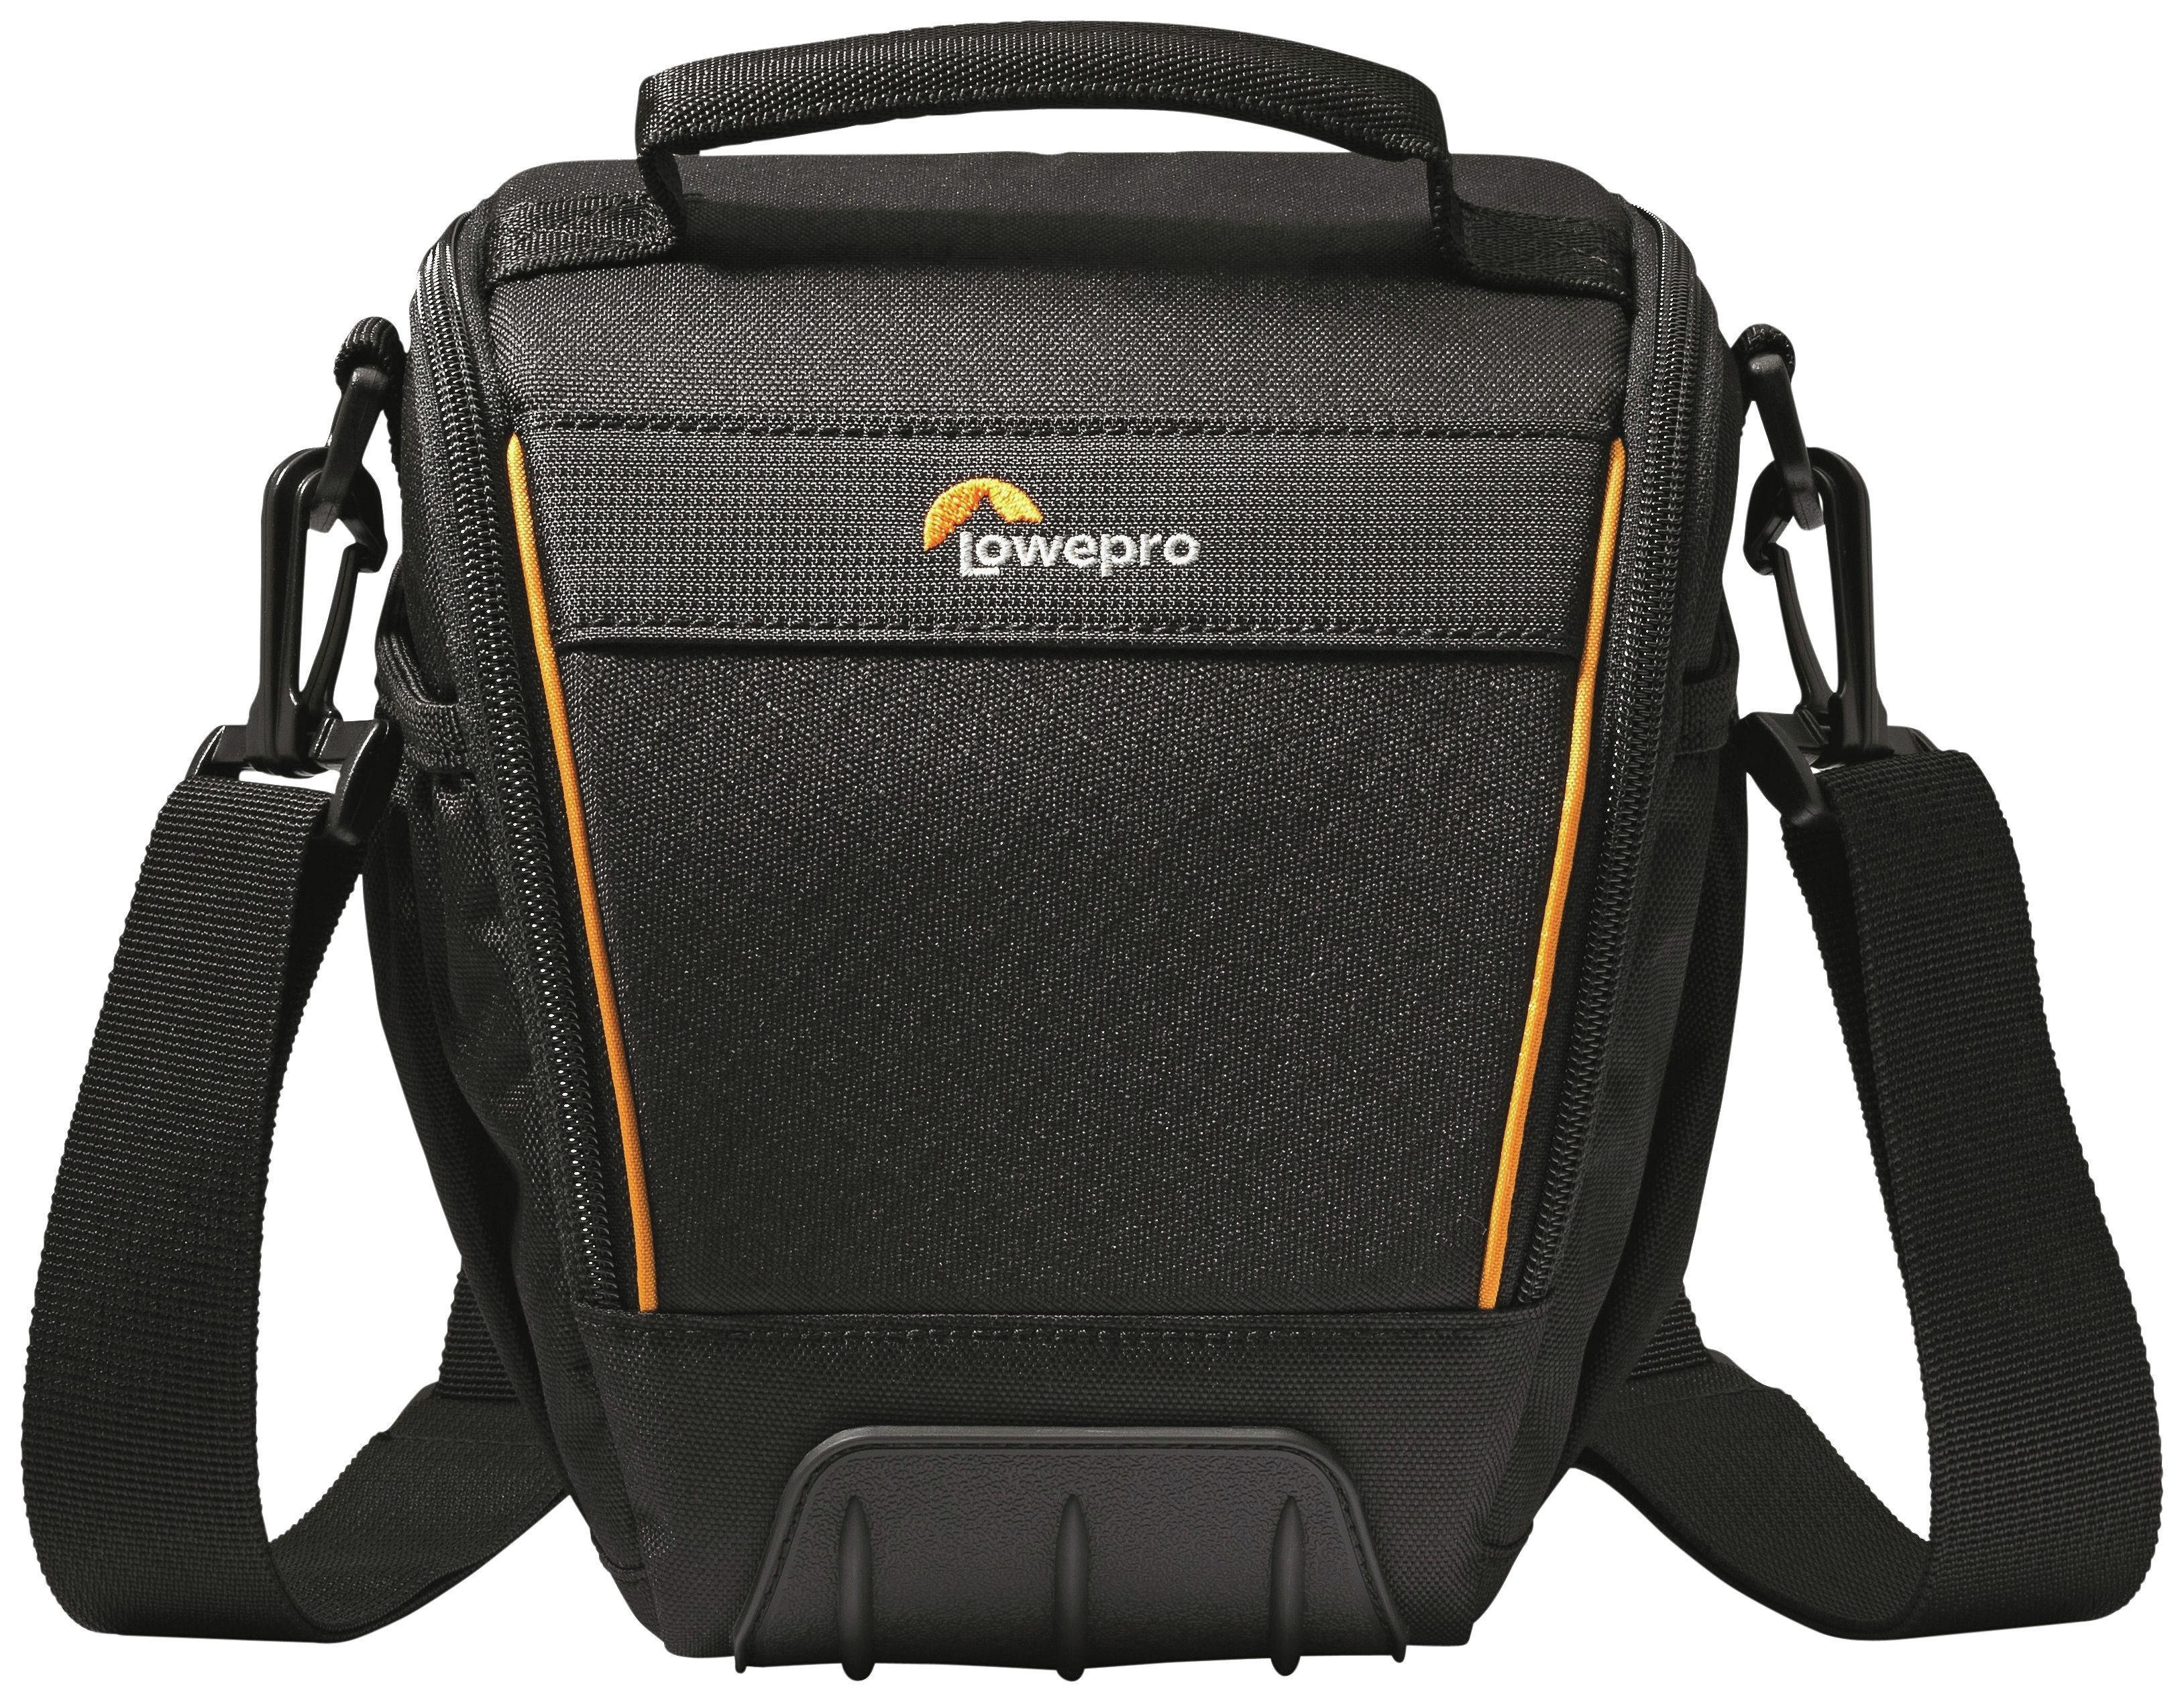 Lowepro Adventura TL30 Case - Black